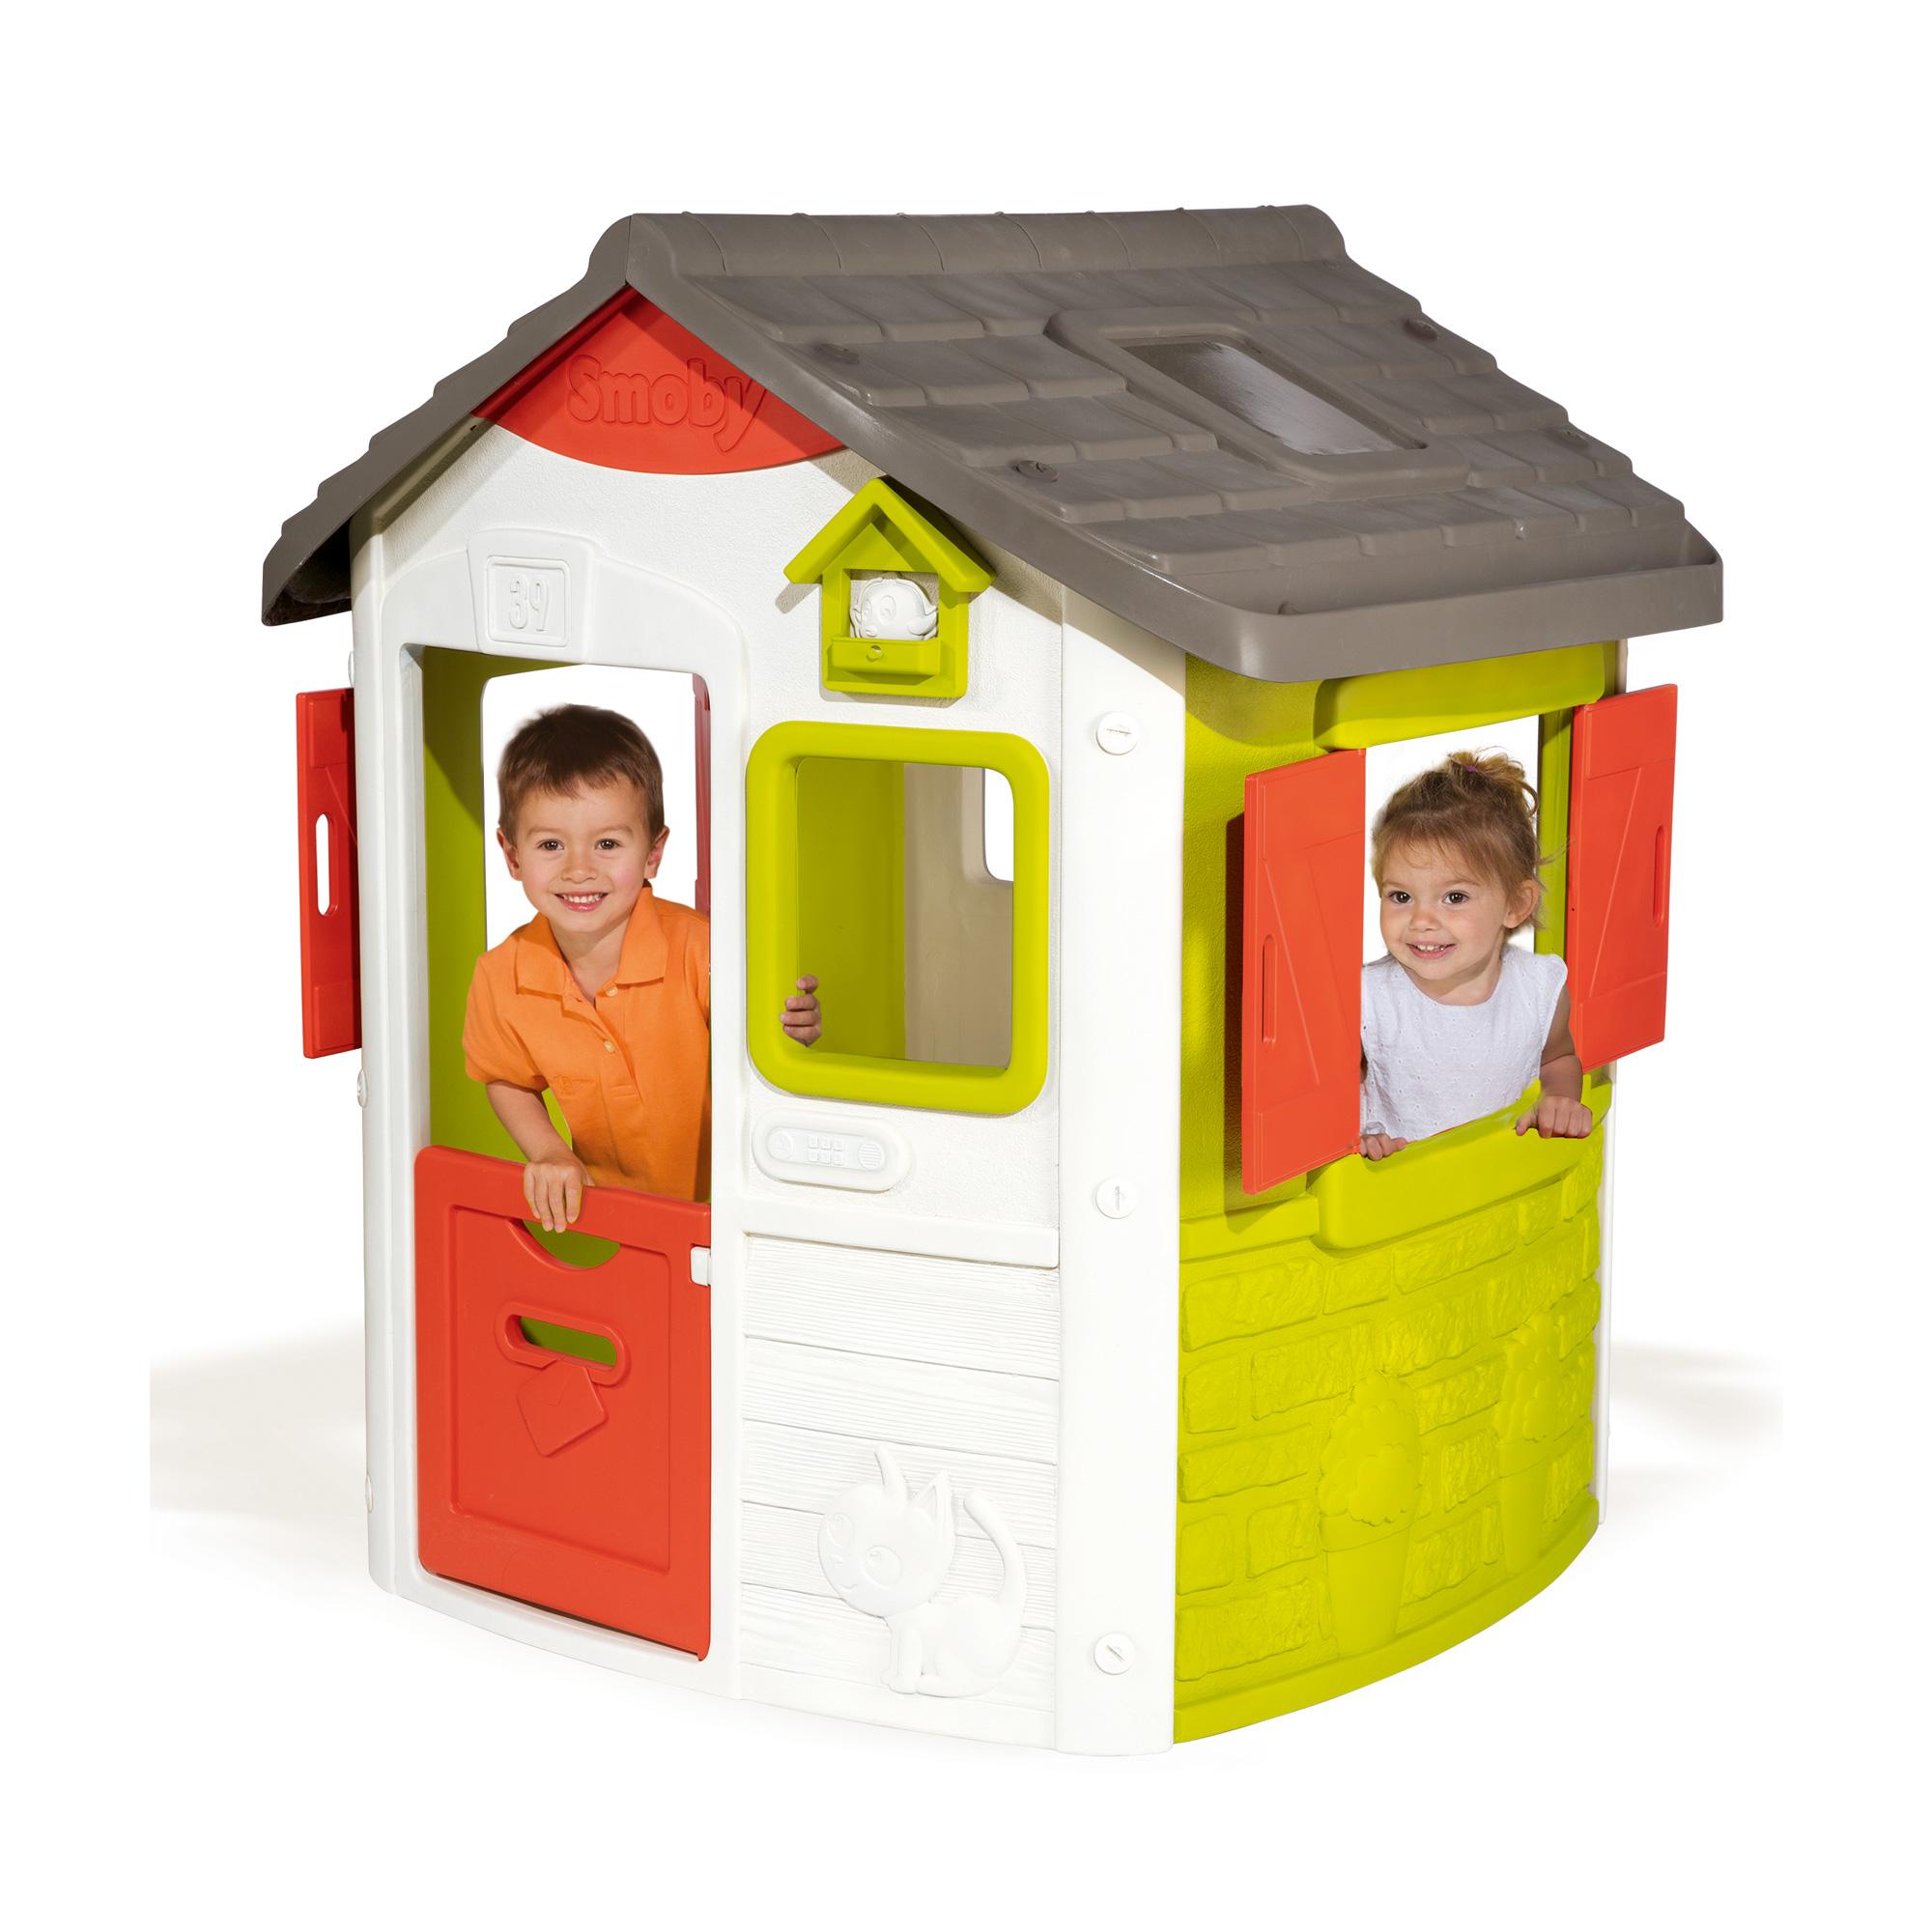 Smoby casa jura lodge new - SMOBY